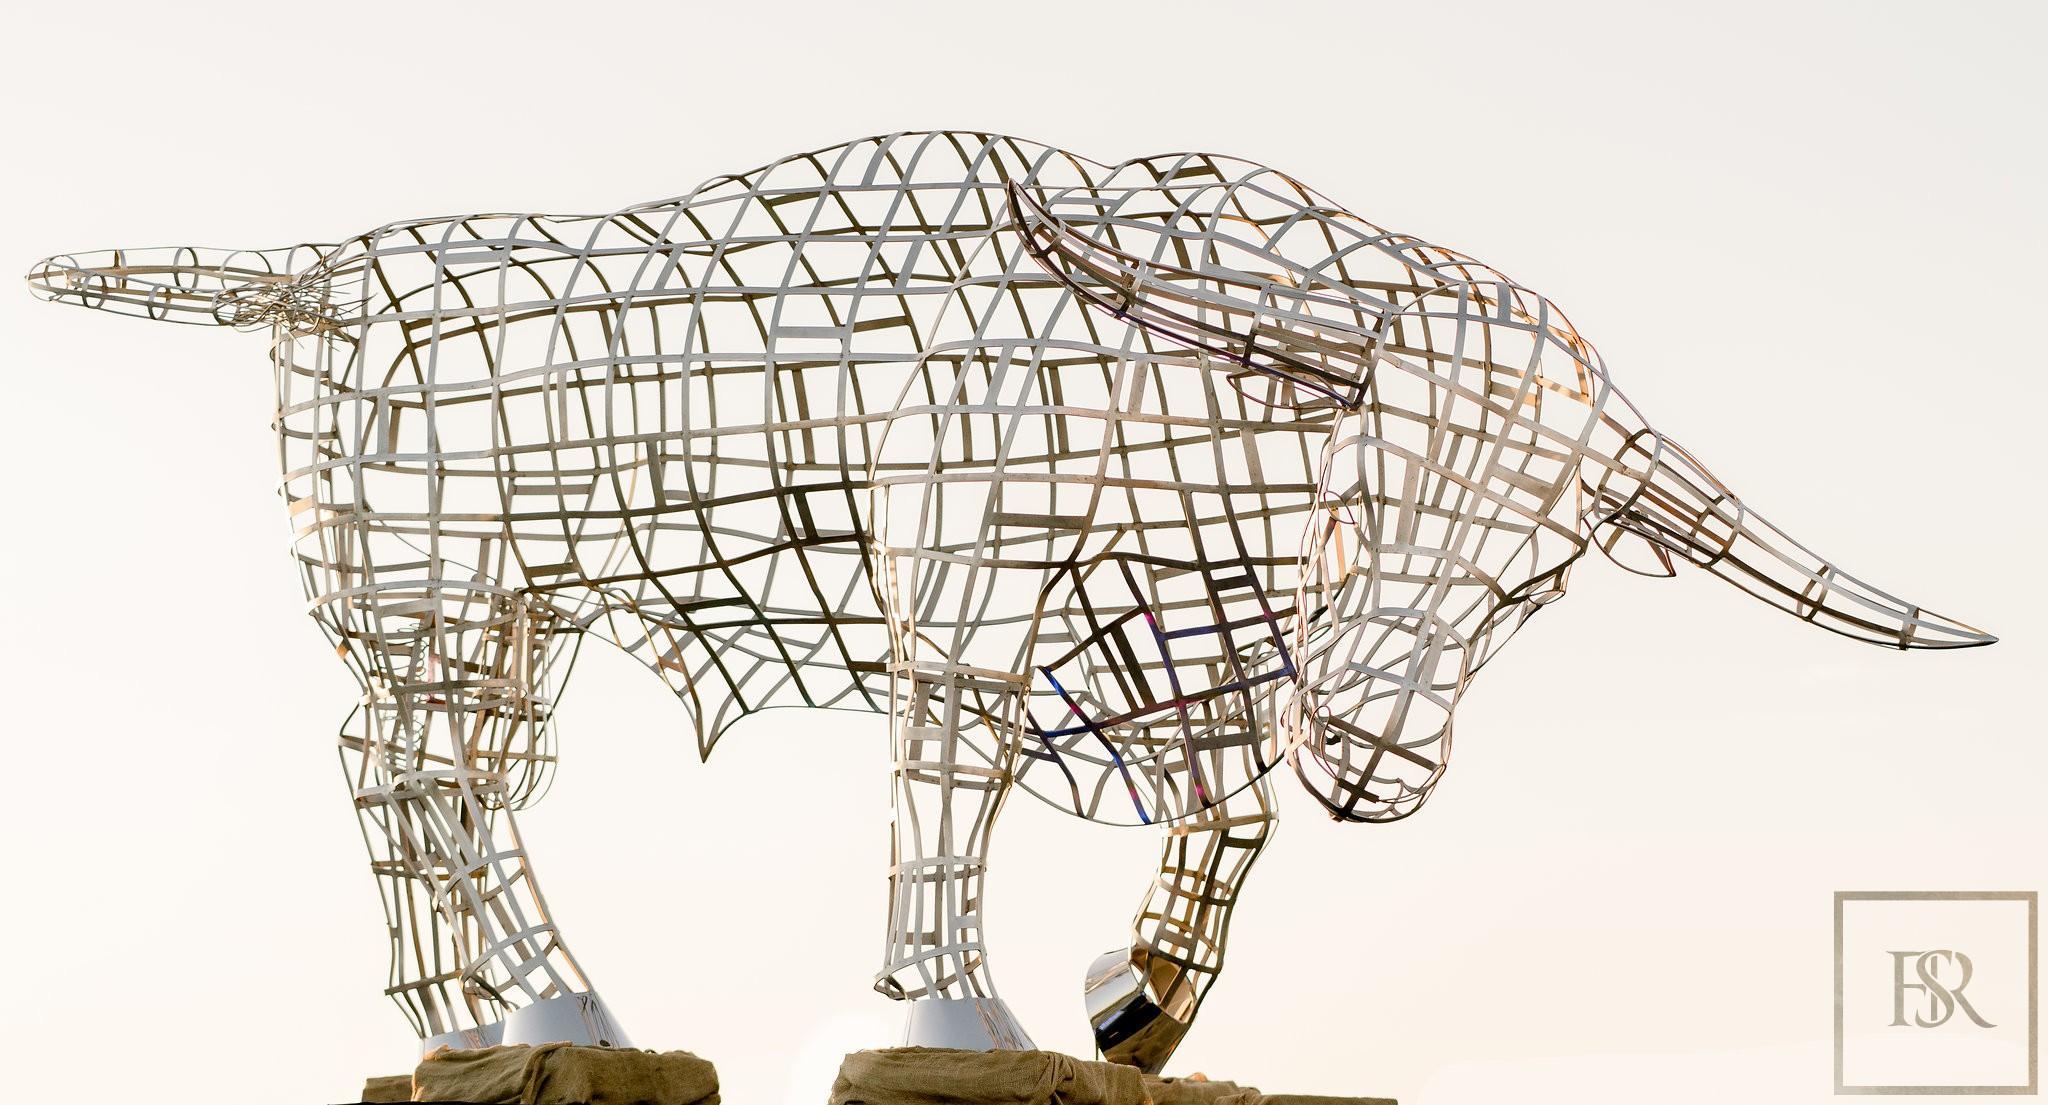 Art Sculpture KHAN - Mathieu Isabelle for sale For Super Rich